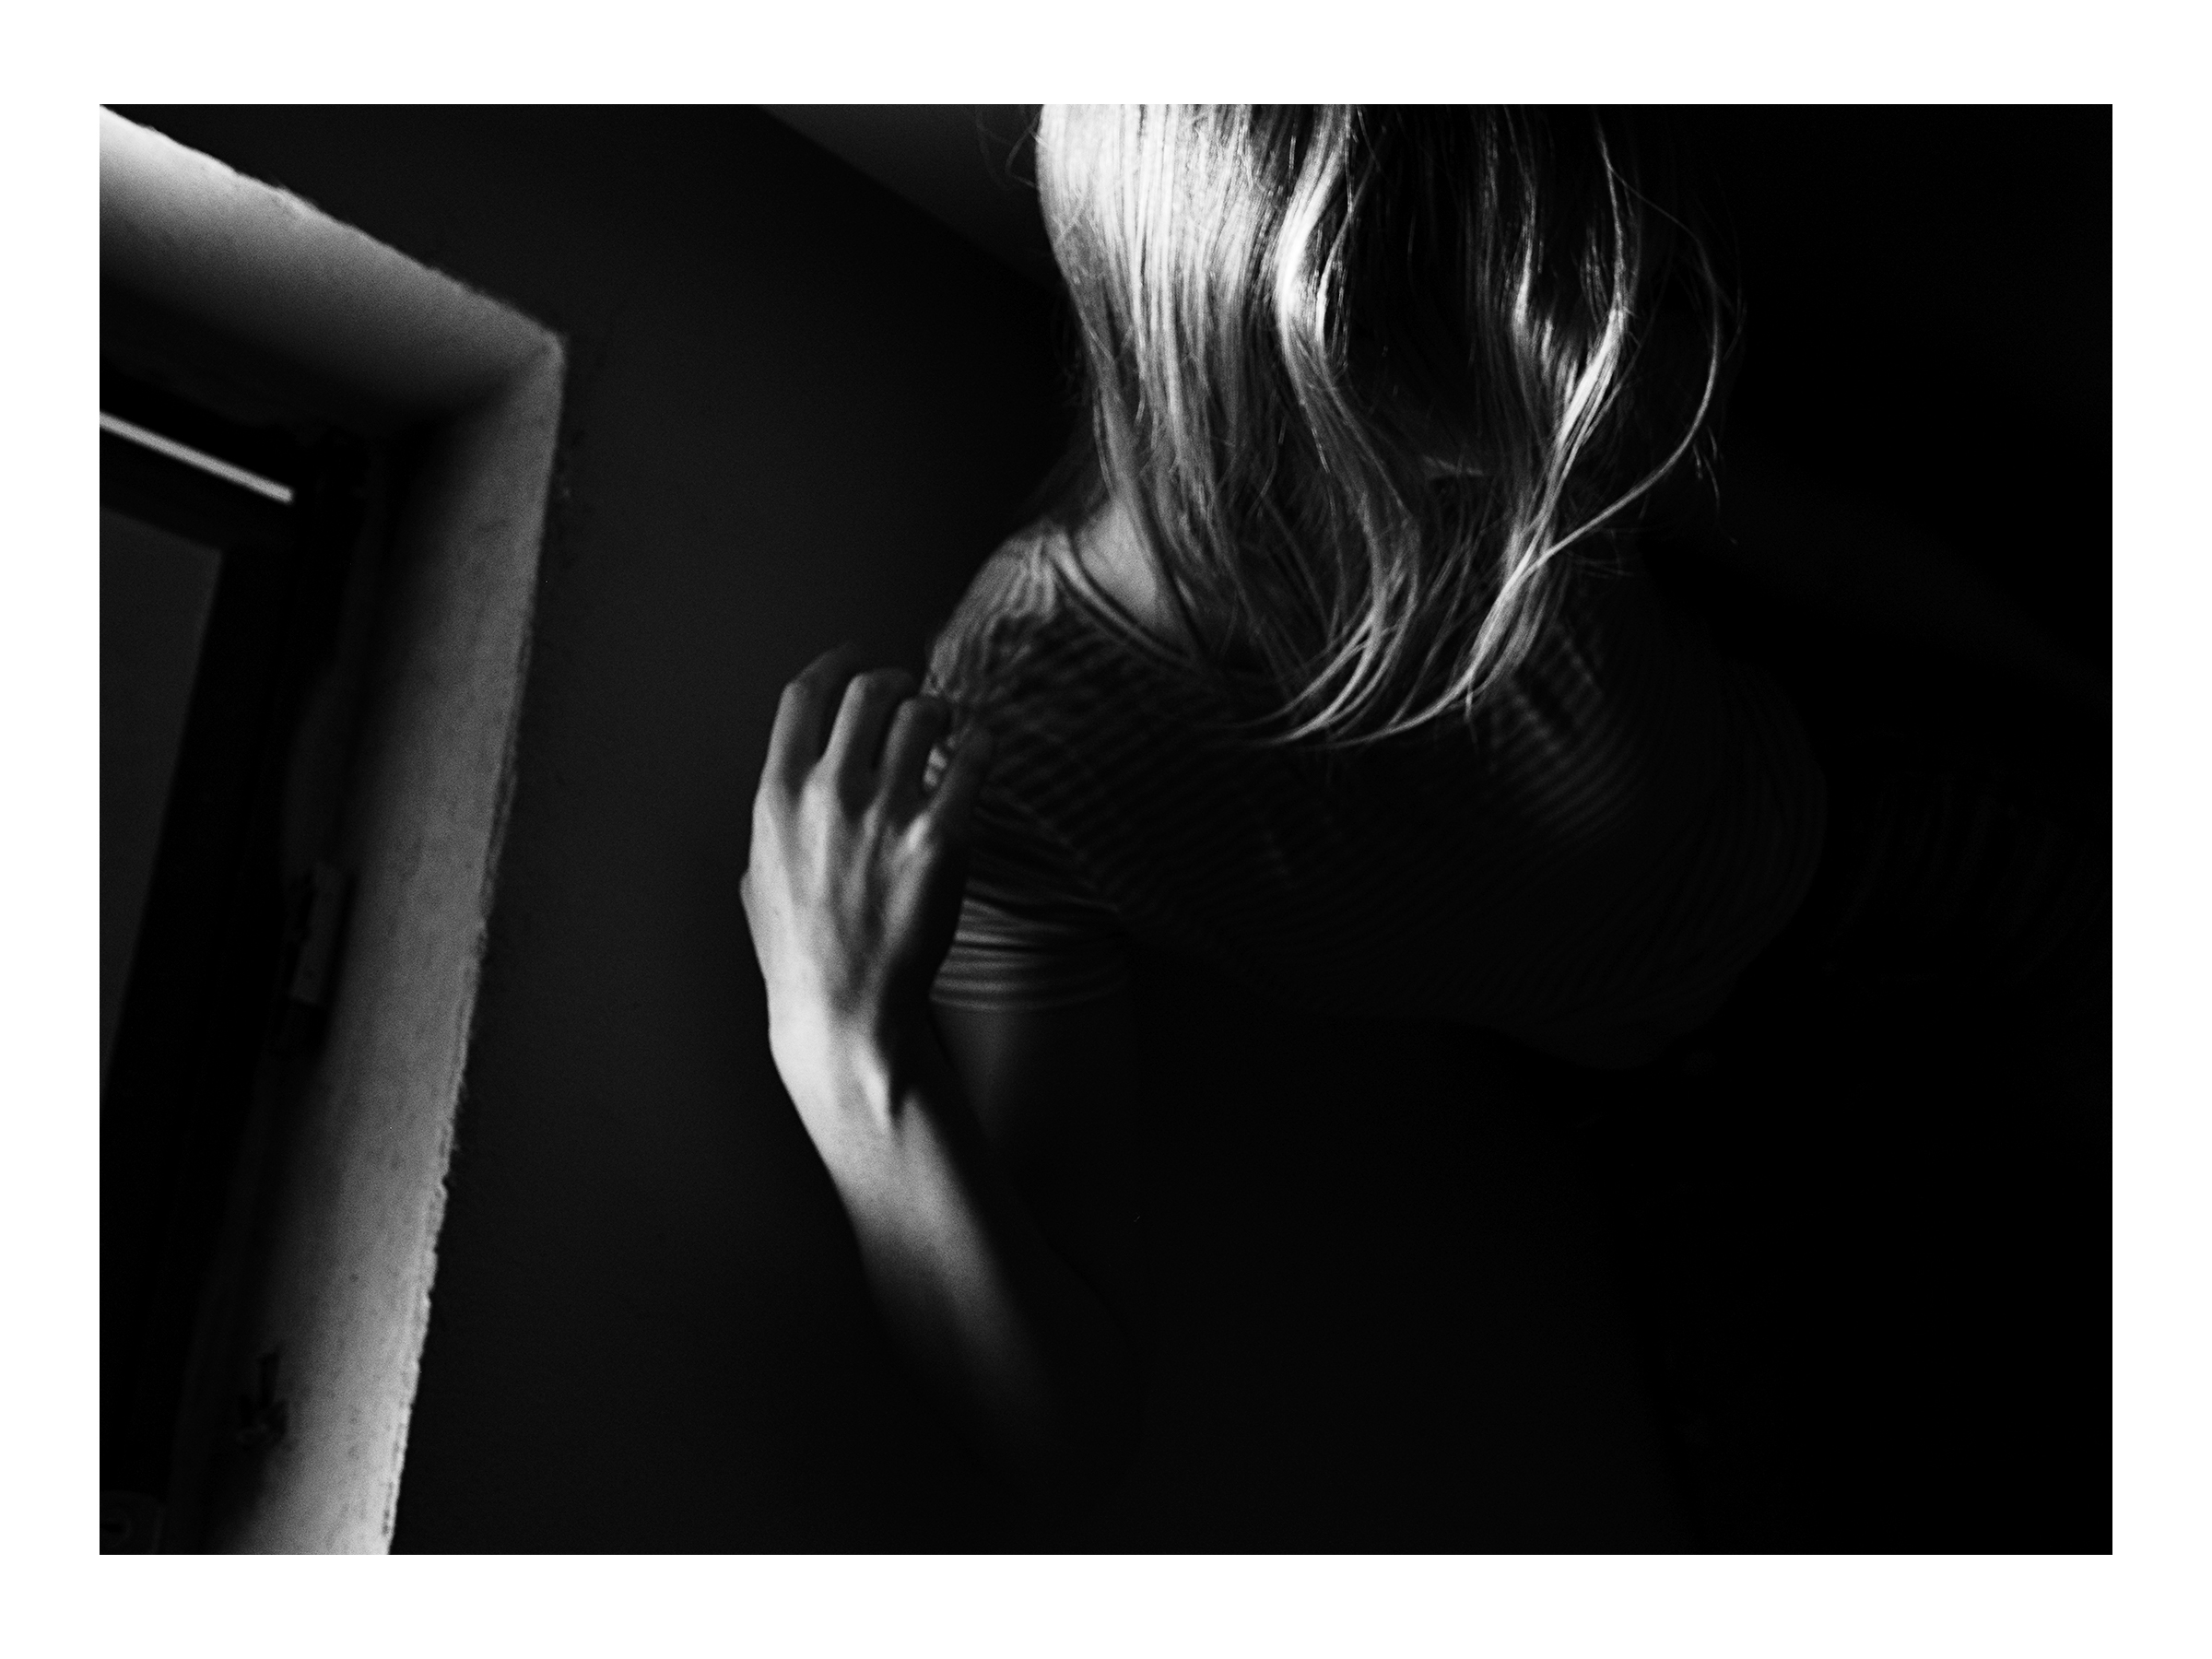 6x8-4-emotion.jpg